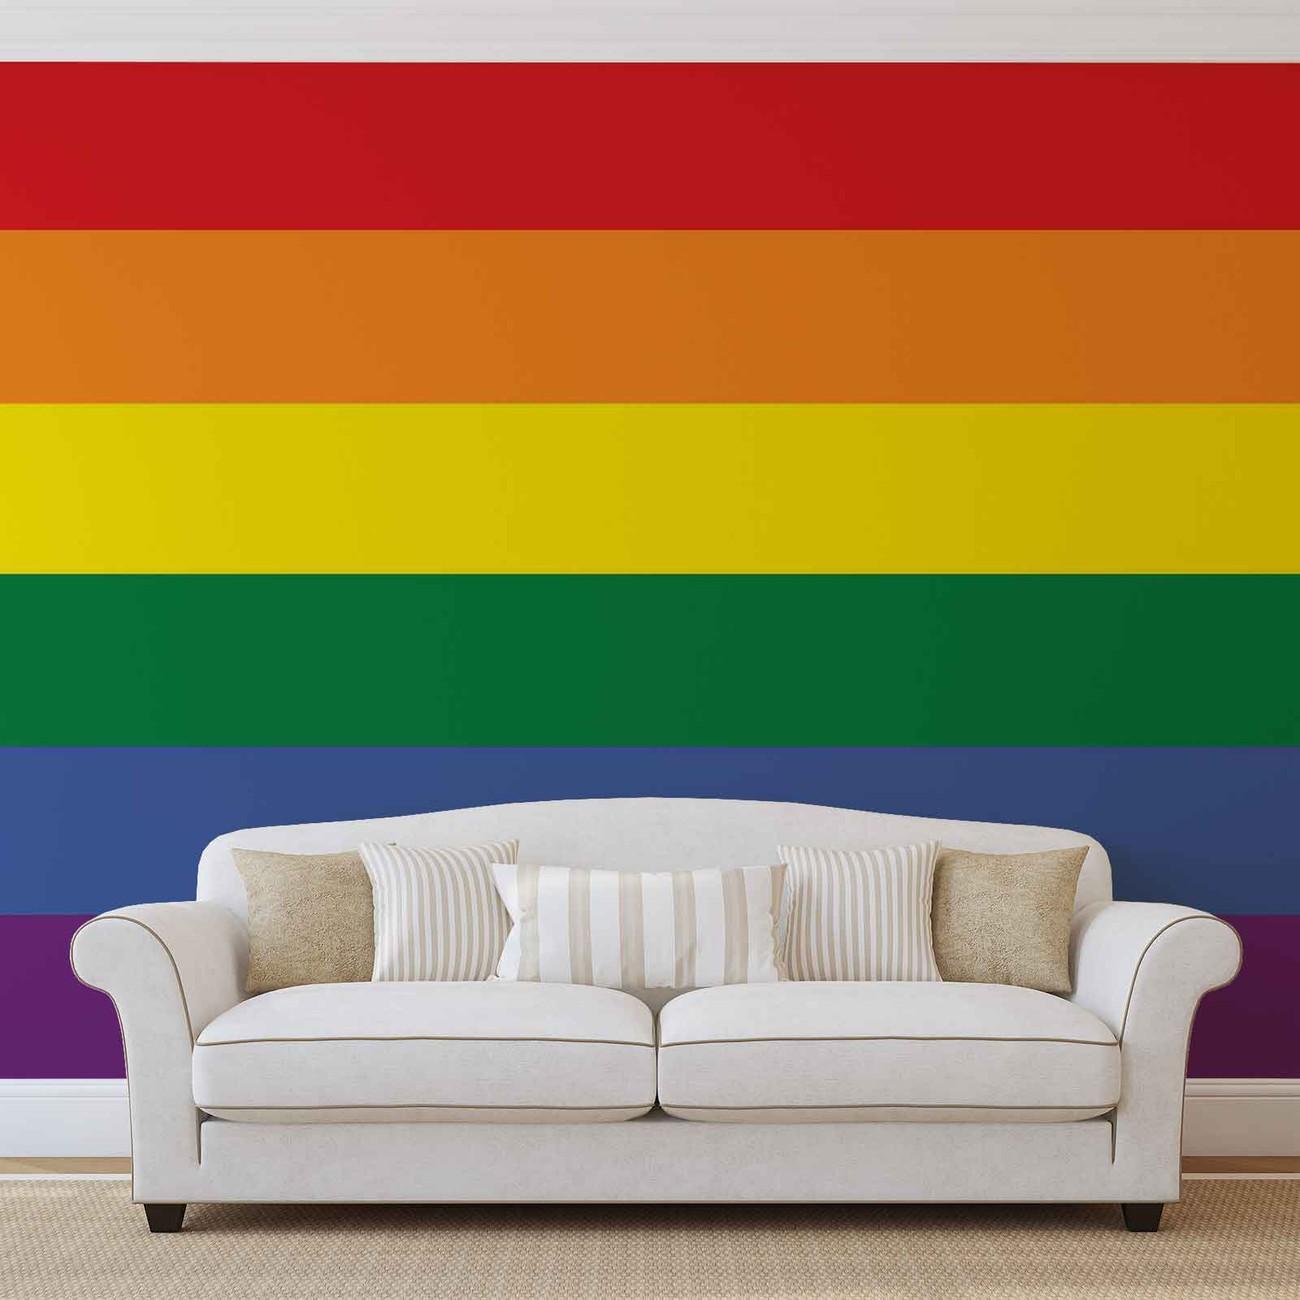 from Jaiden gay parati